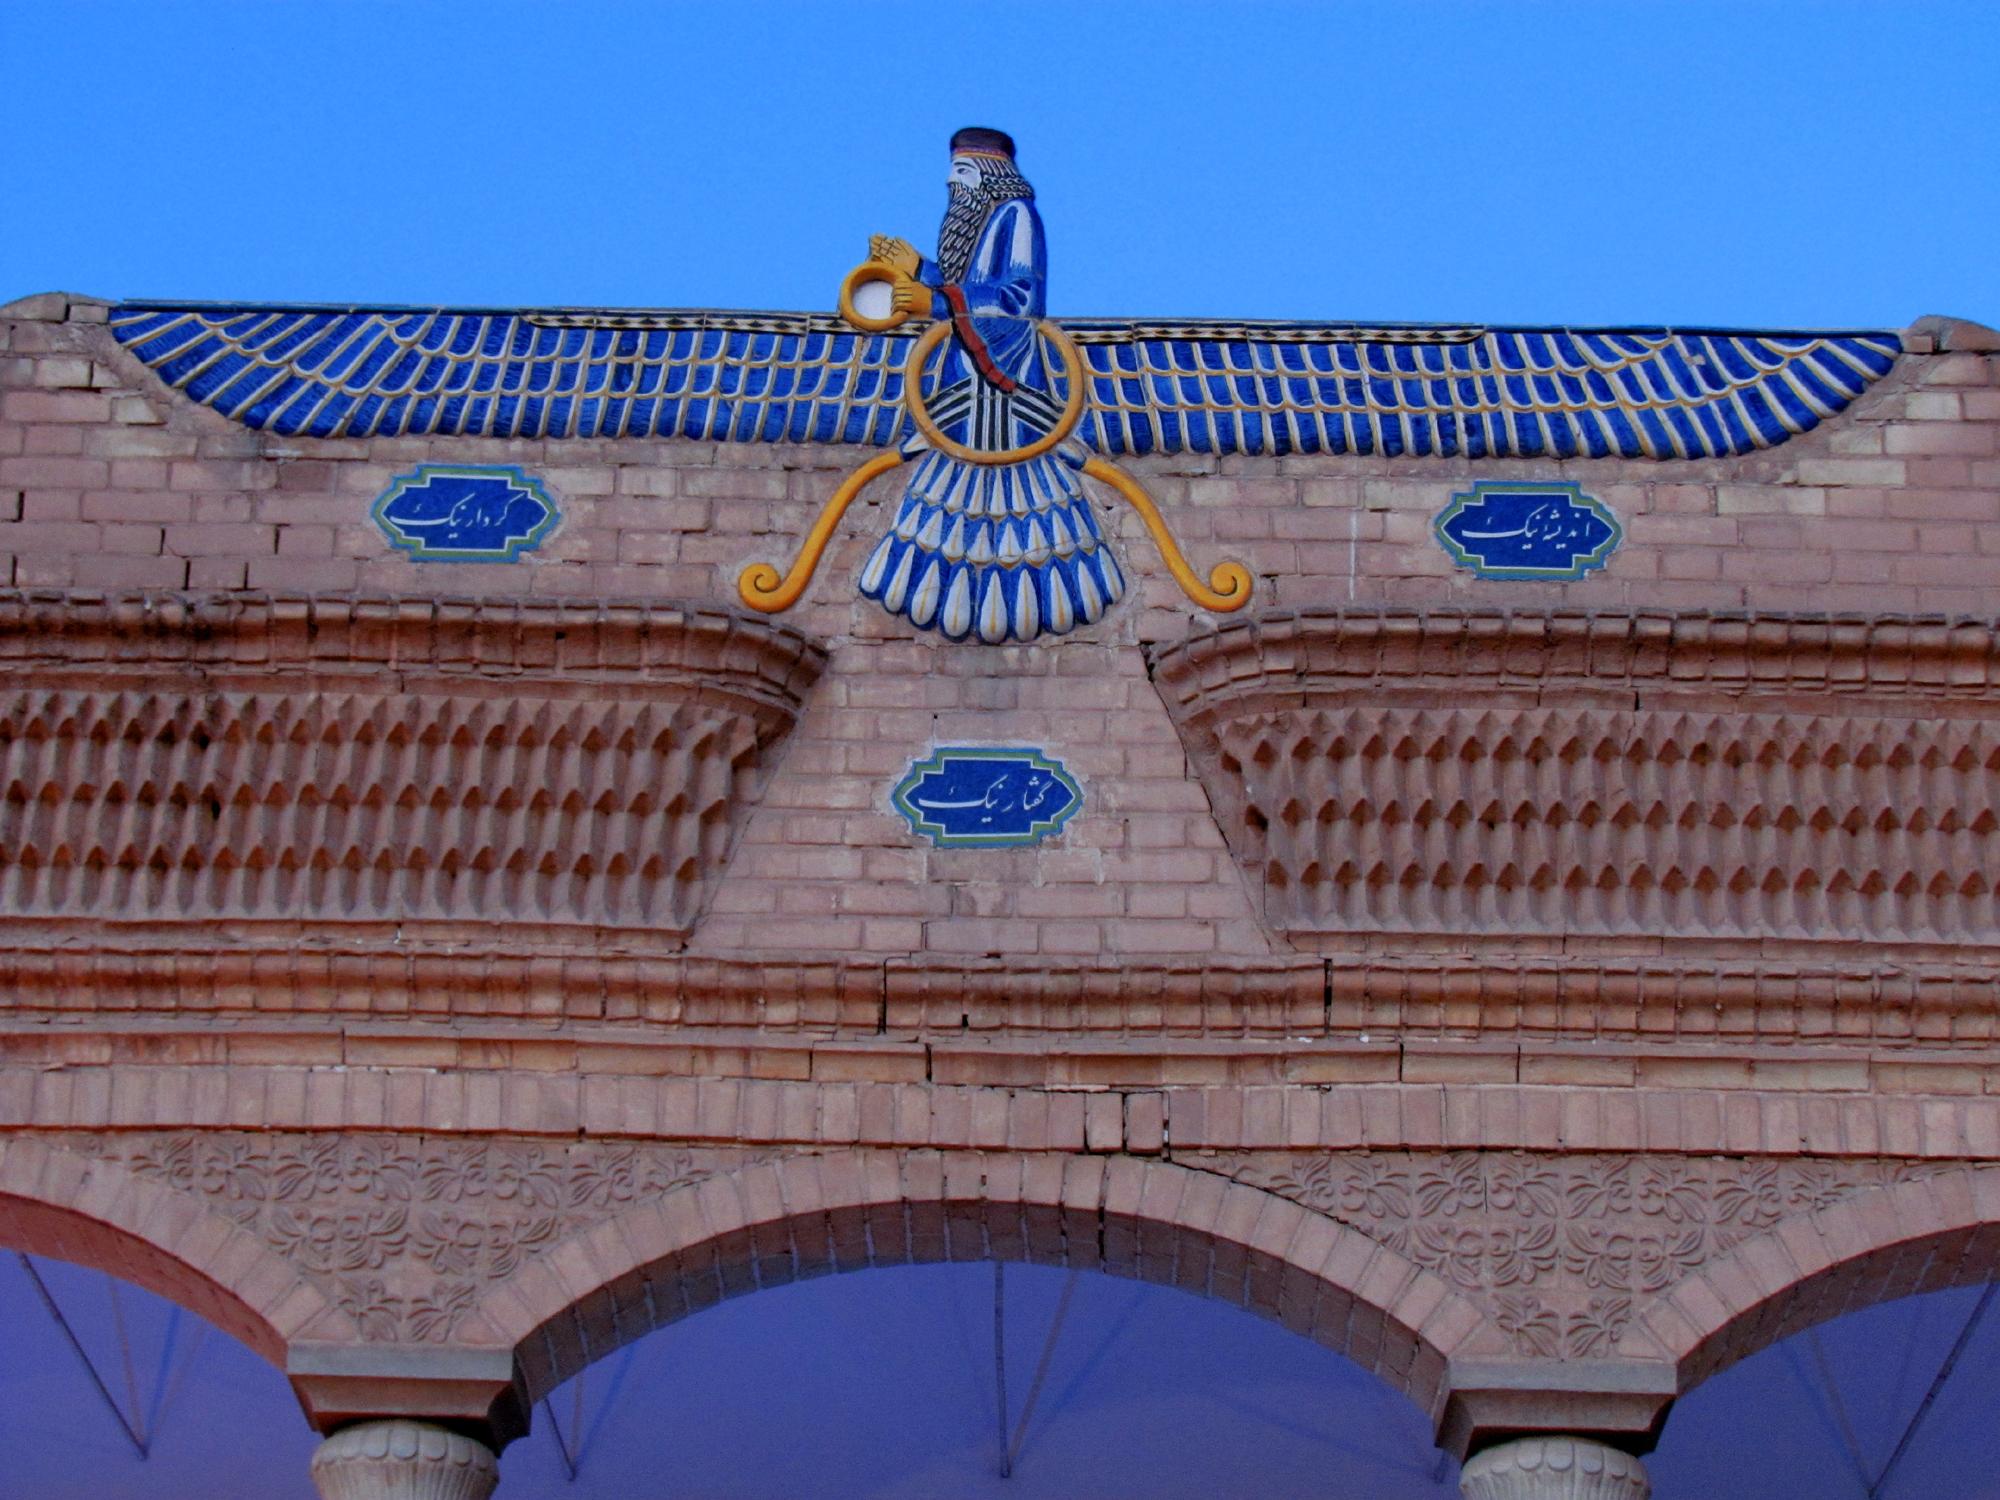 File:Zoroastrian temple of Yazd.jpg - Wikimedia Commons